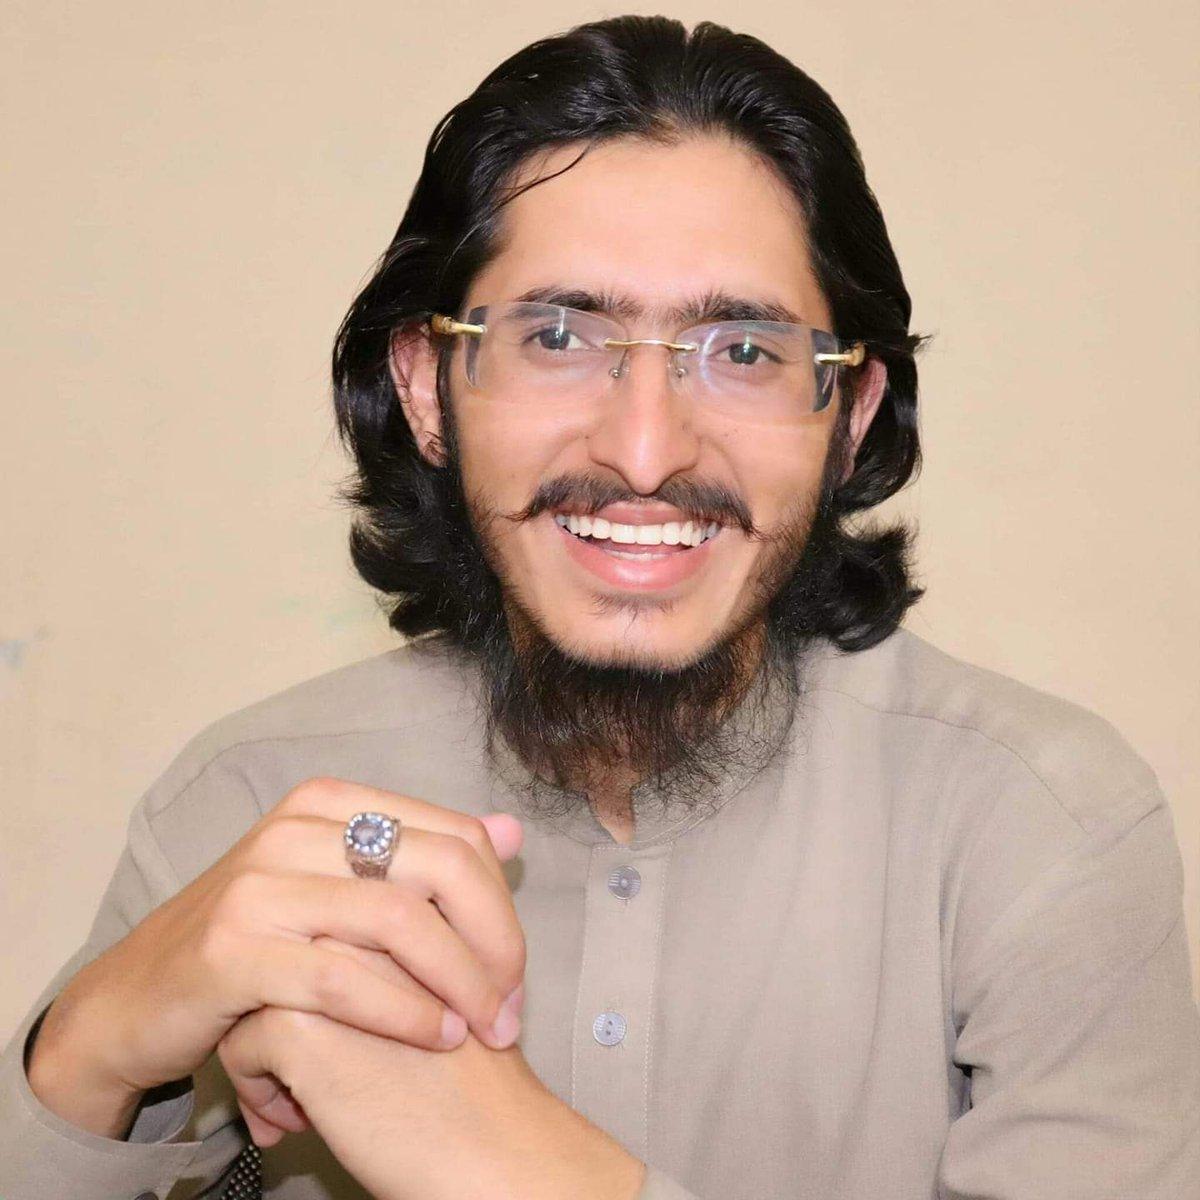 Look at his smiling face, May God grant him jannah.  #Justice4MuhammadBilalKhan<br>http://pic.twitter.com/yGkZD1JcH6